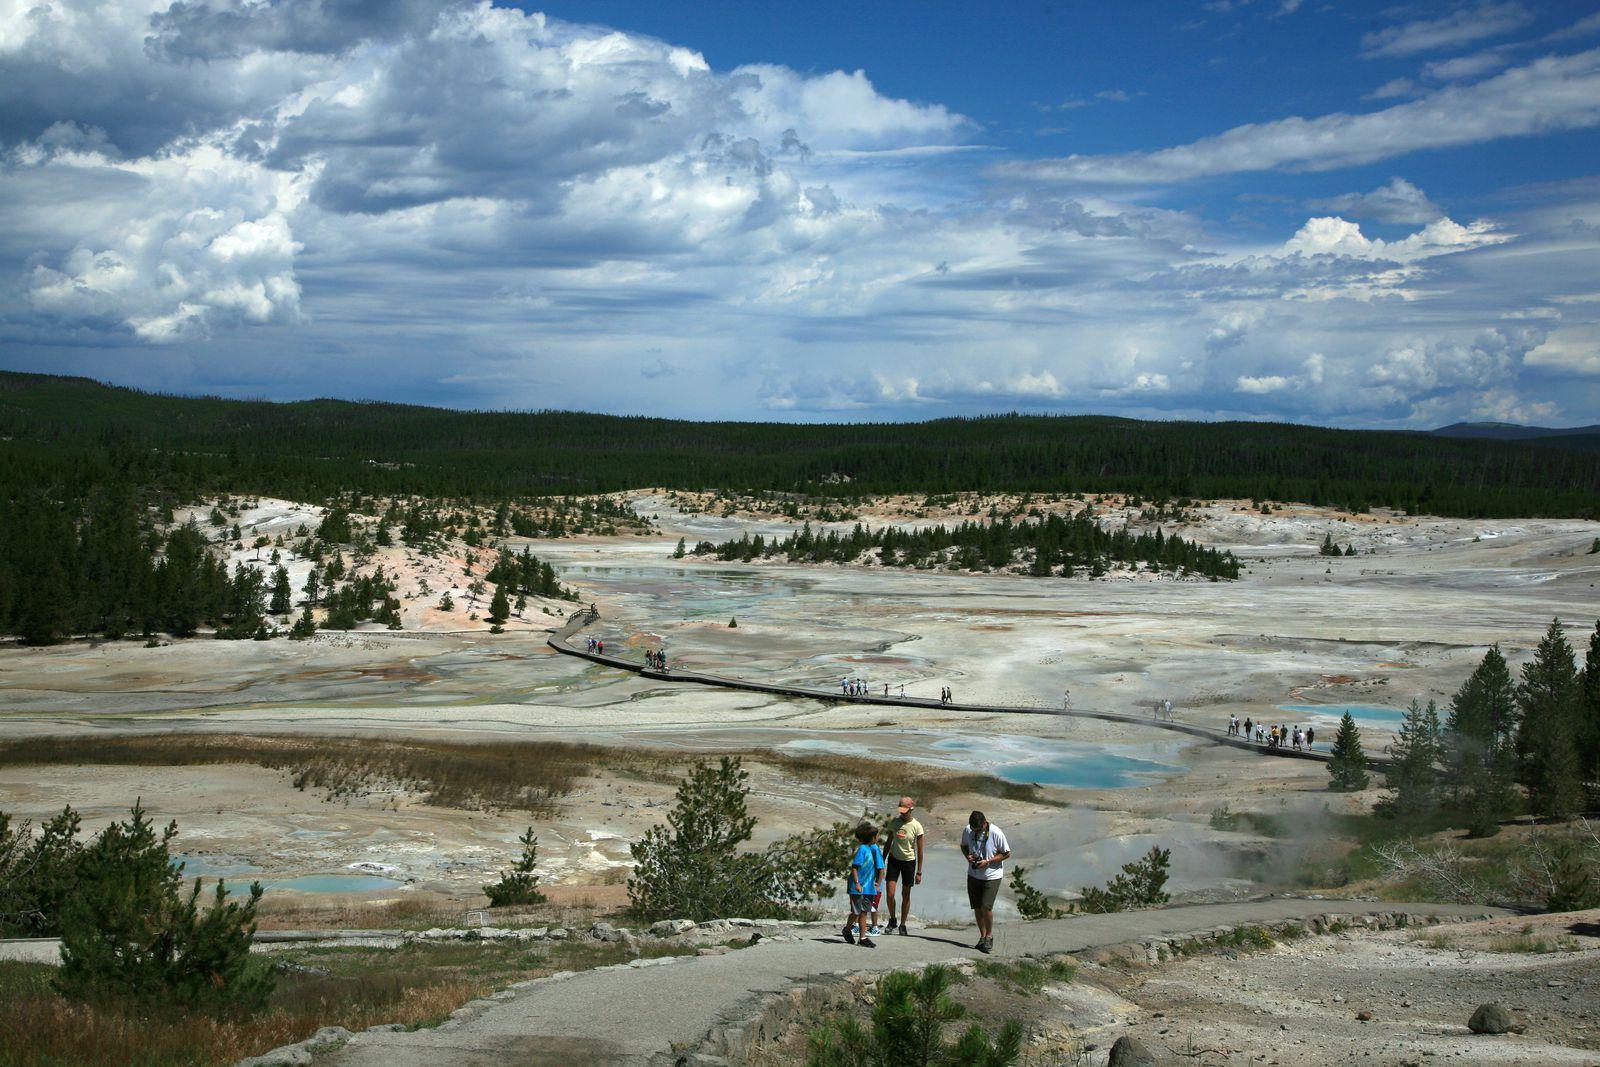 Yellowstone - Norris geyser basin - photo archives © Bernard Duyck 2009